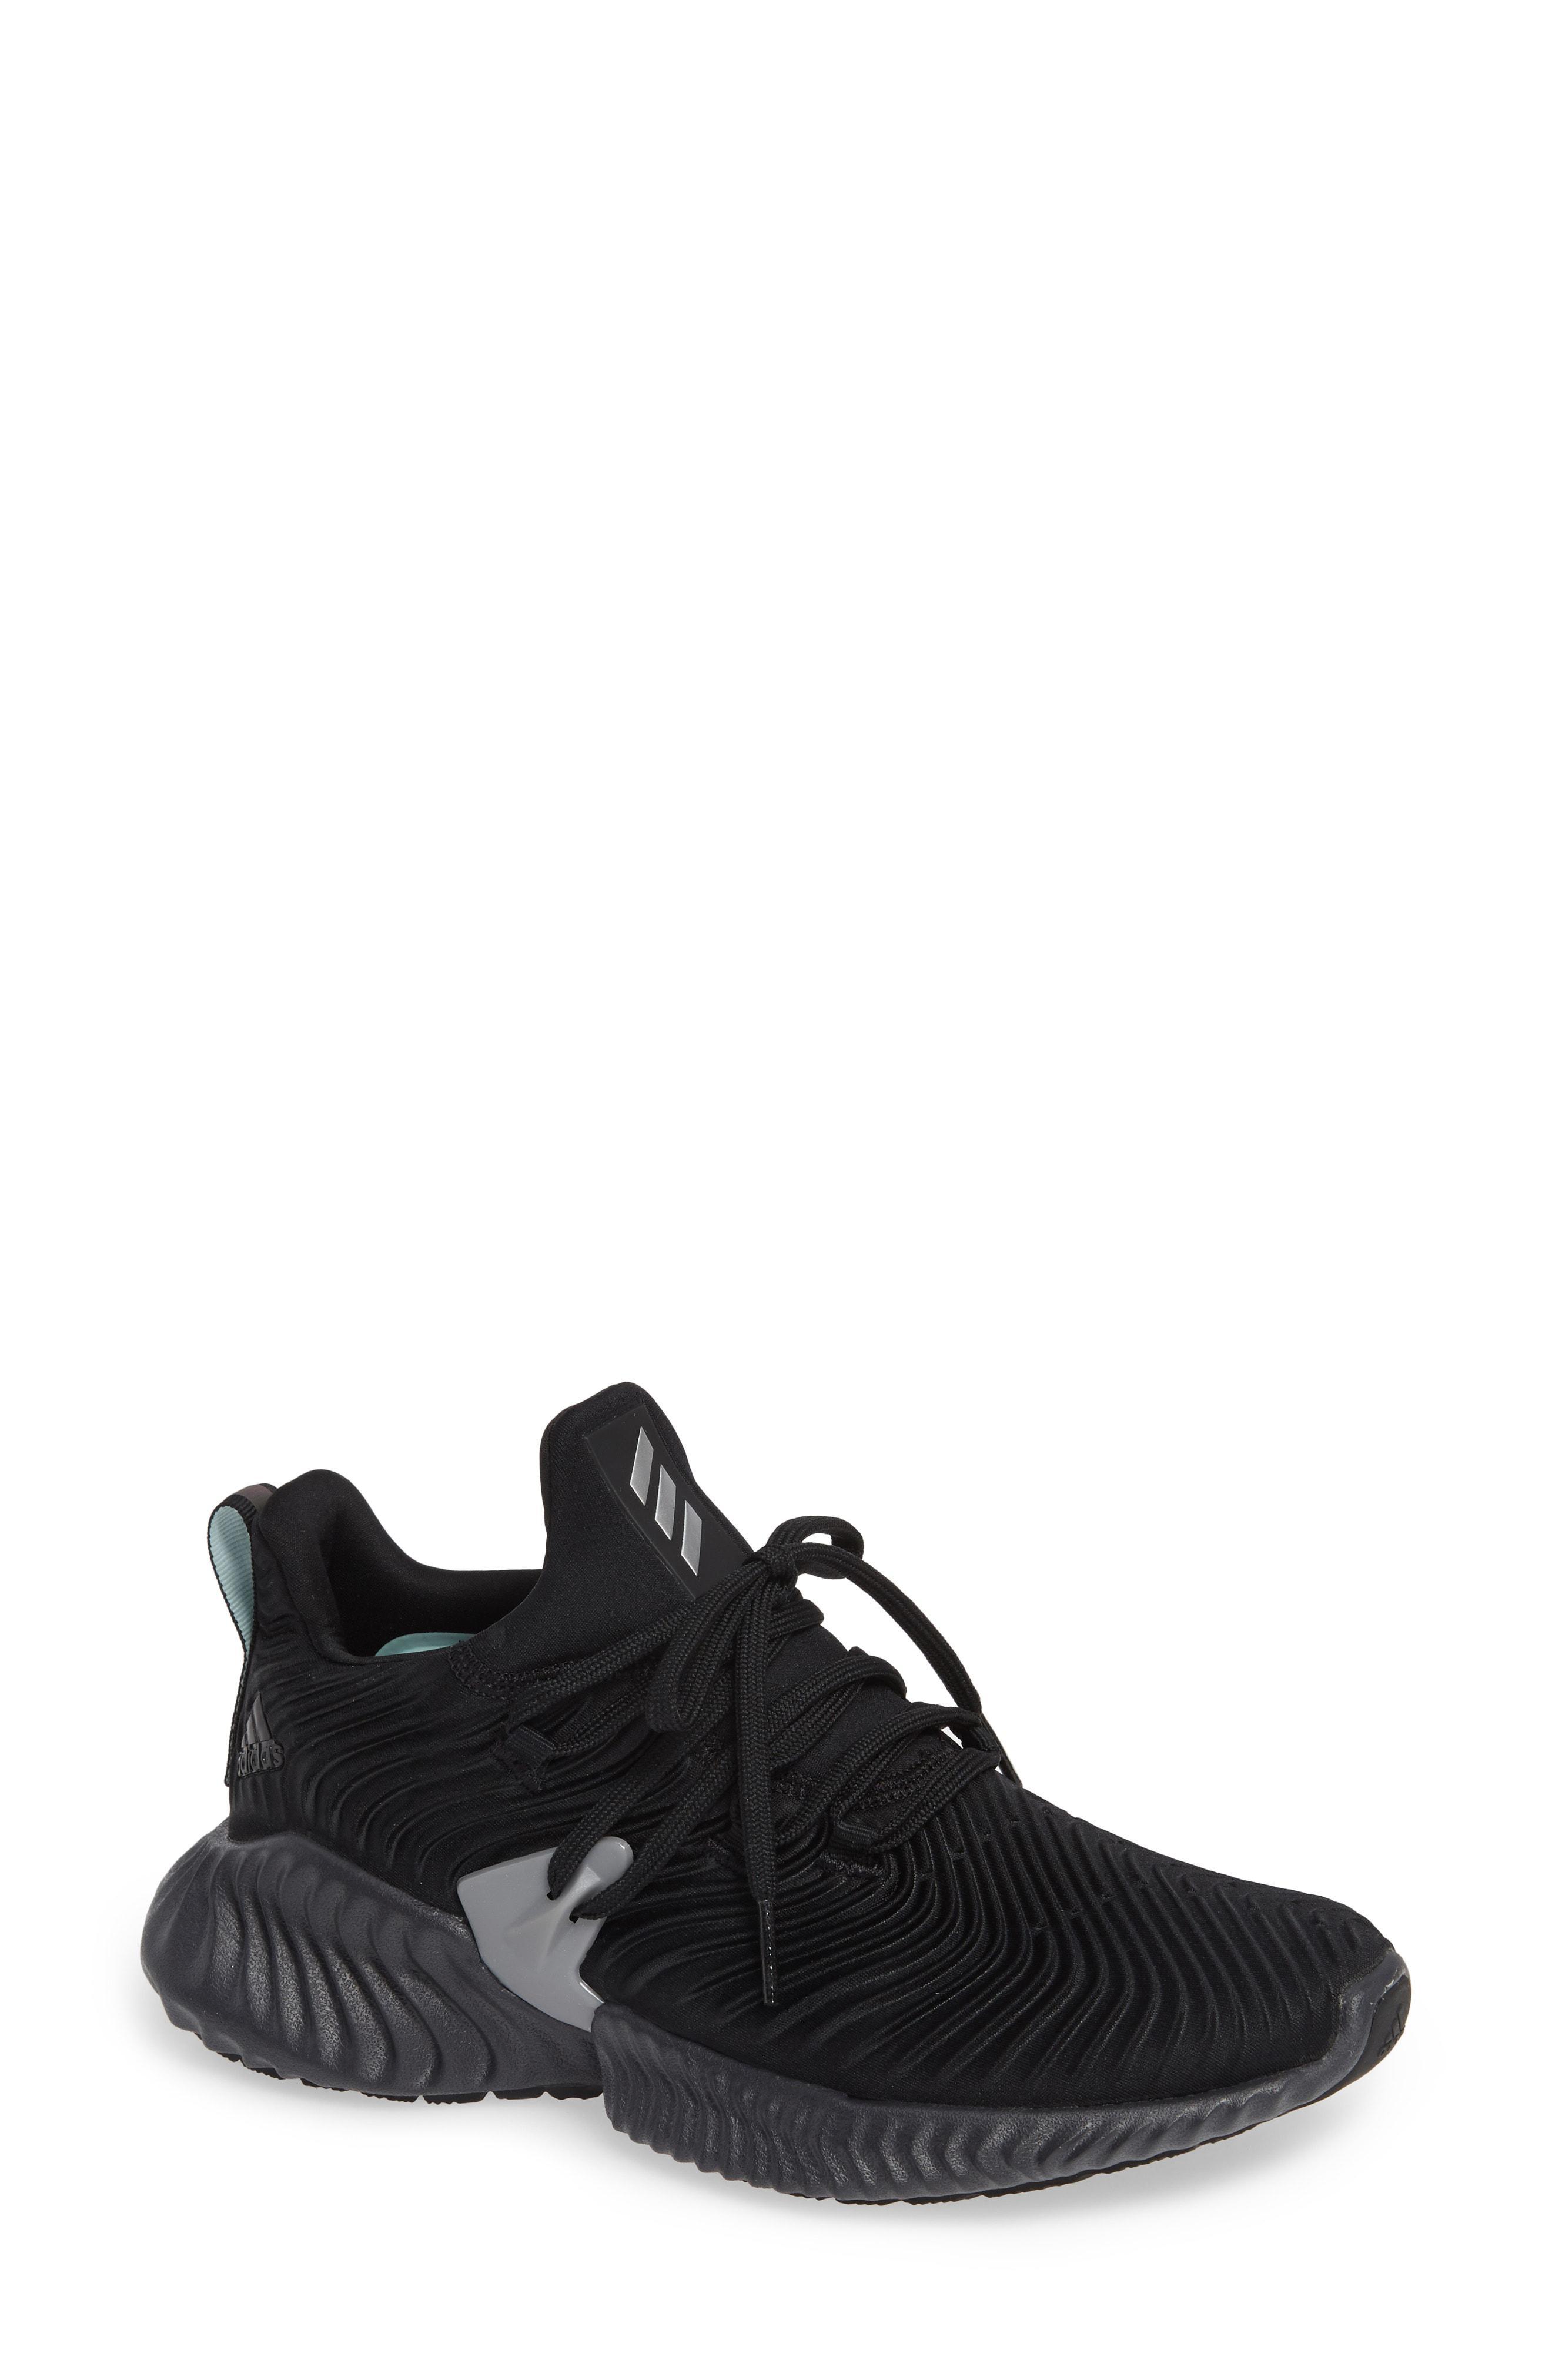 quality design bcadb 2f1eb Lyst - adidas Alphabounce Instinct Sneaker in Black